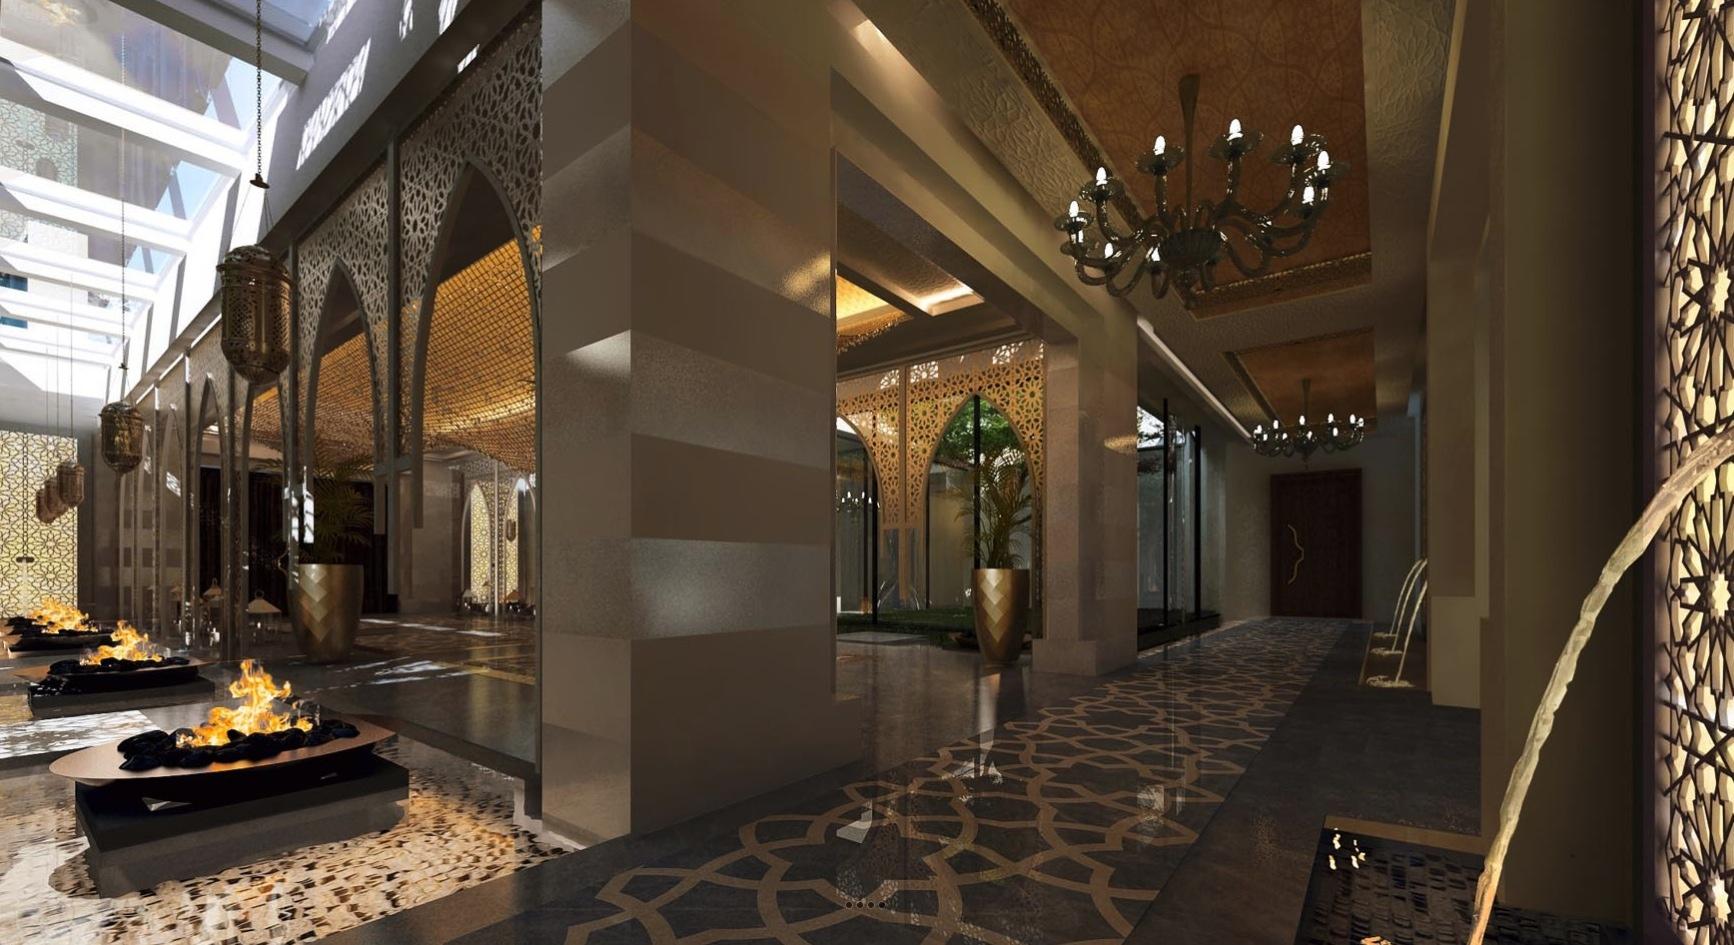 Inspired Interiors: Moroccan Style Interior Design